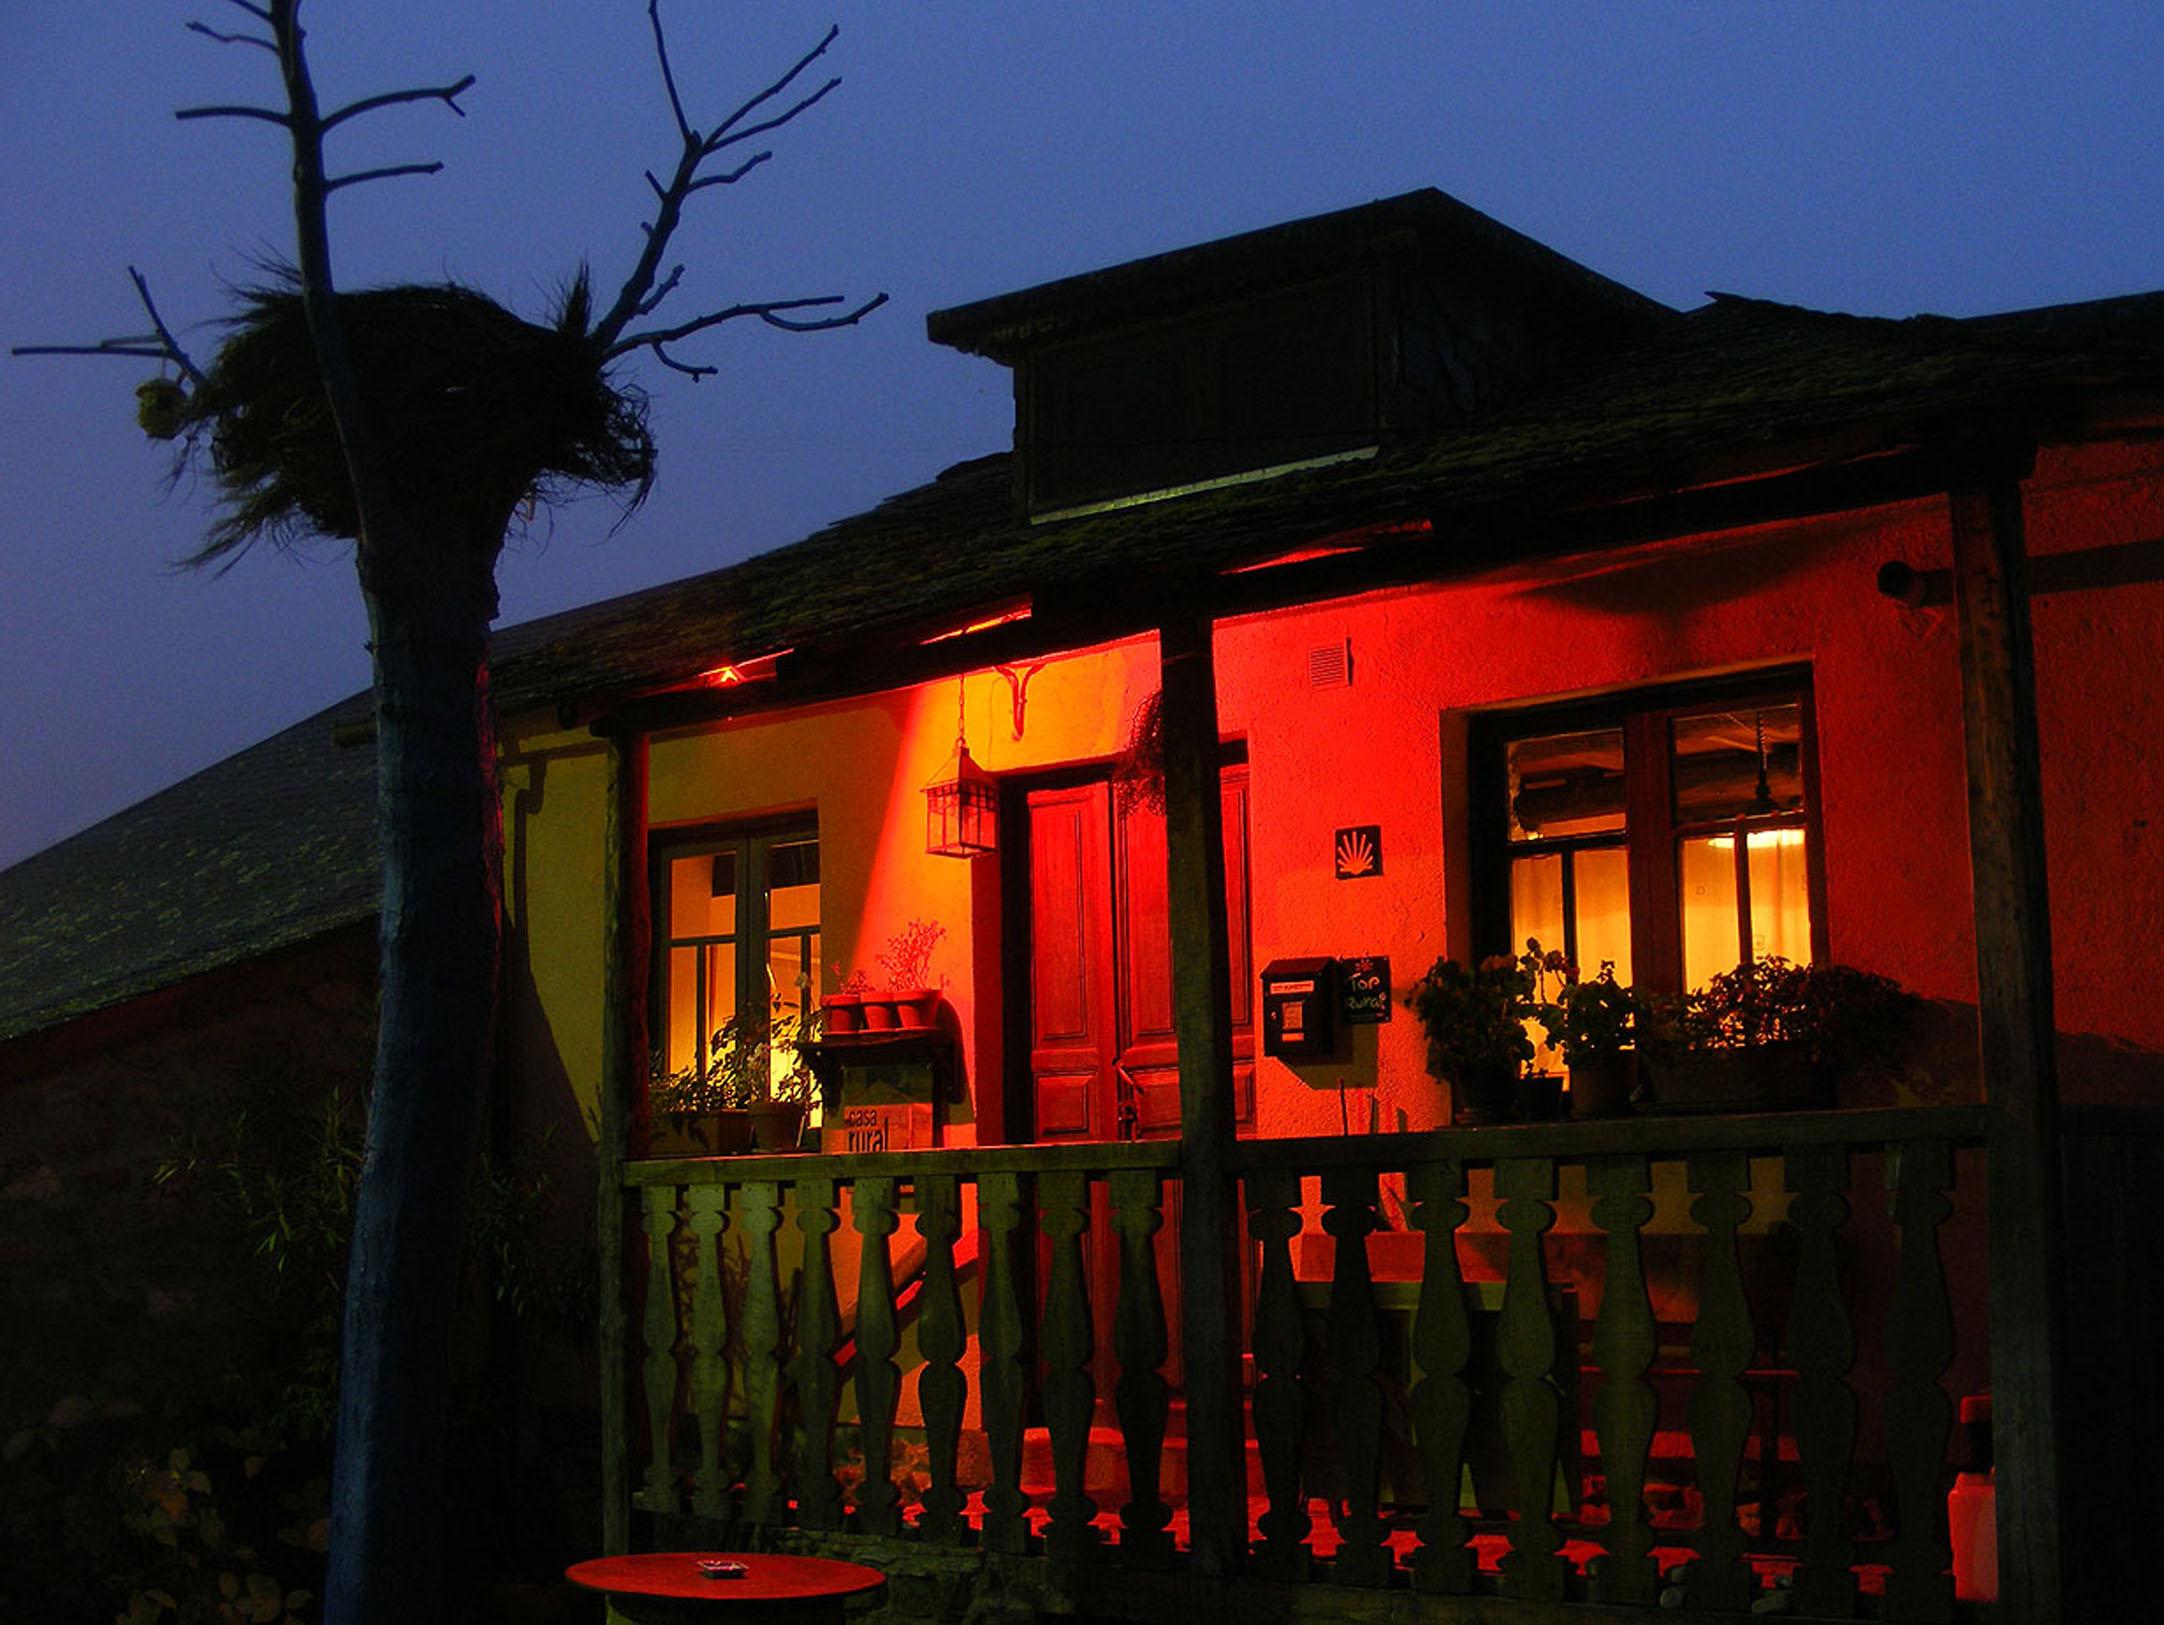 nogala iluminada nocturna